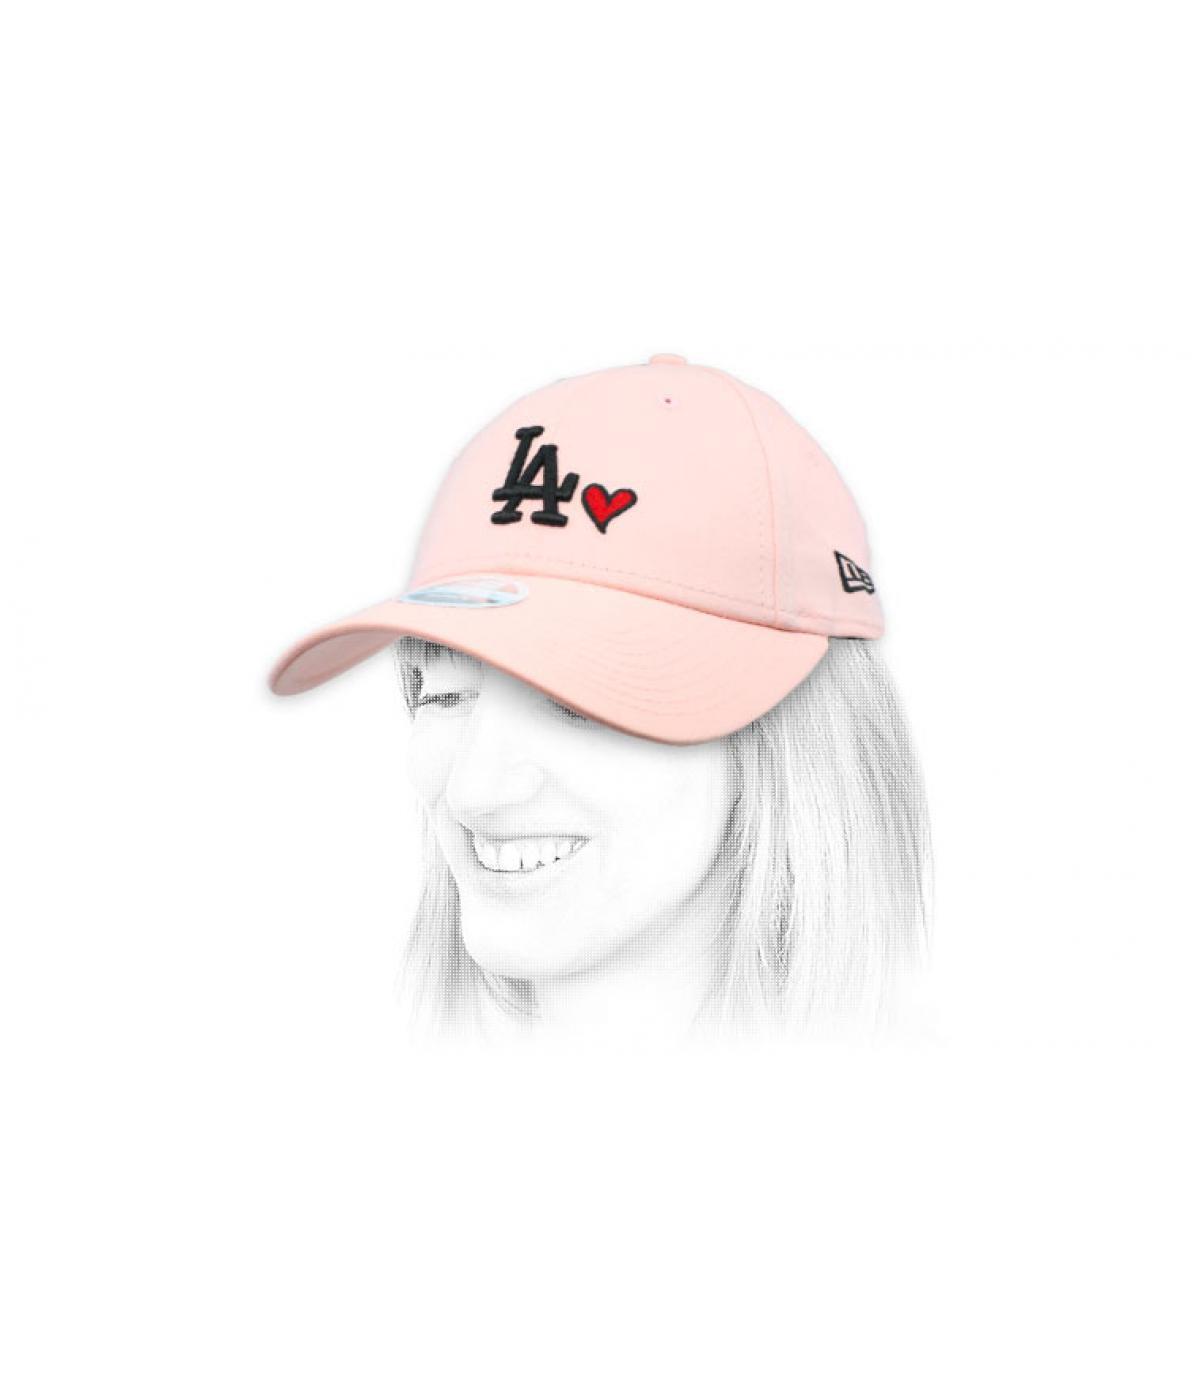 82e8caccc85f Buy women cap - Online caps shop